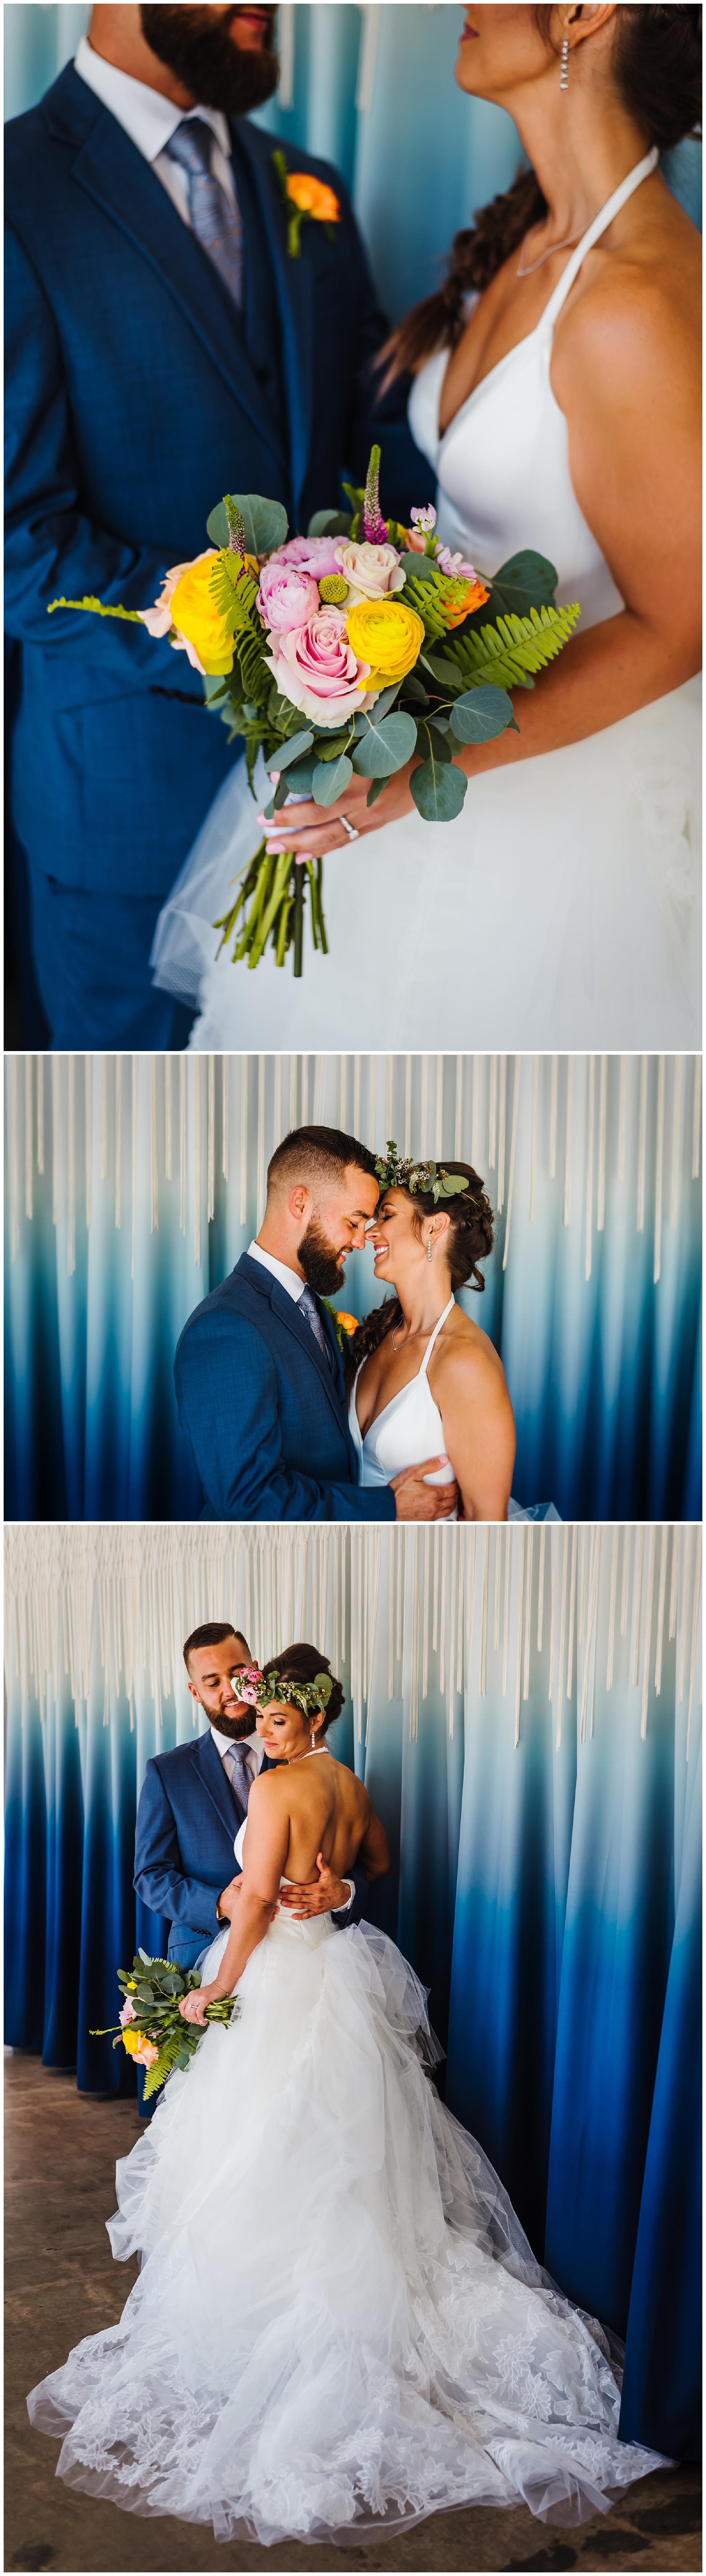 Tampa-wedding-photographer-vera-wang-flower-crown-post-card-inn_0015.jpg